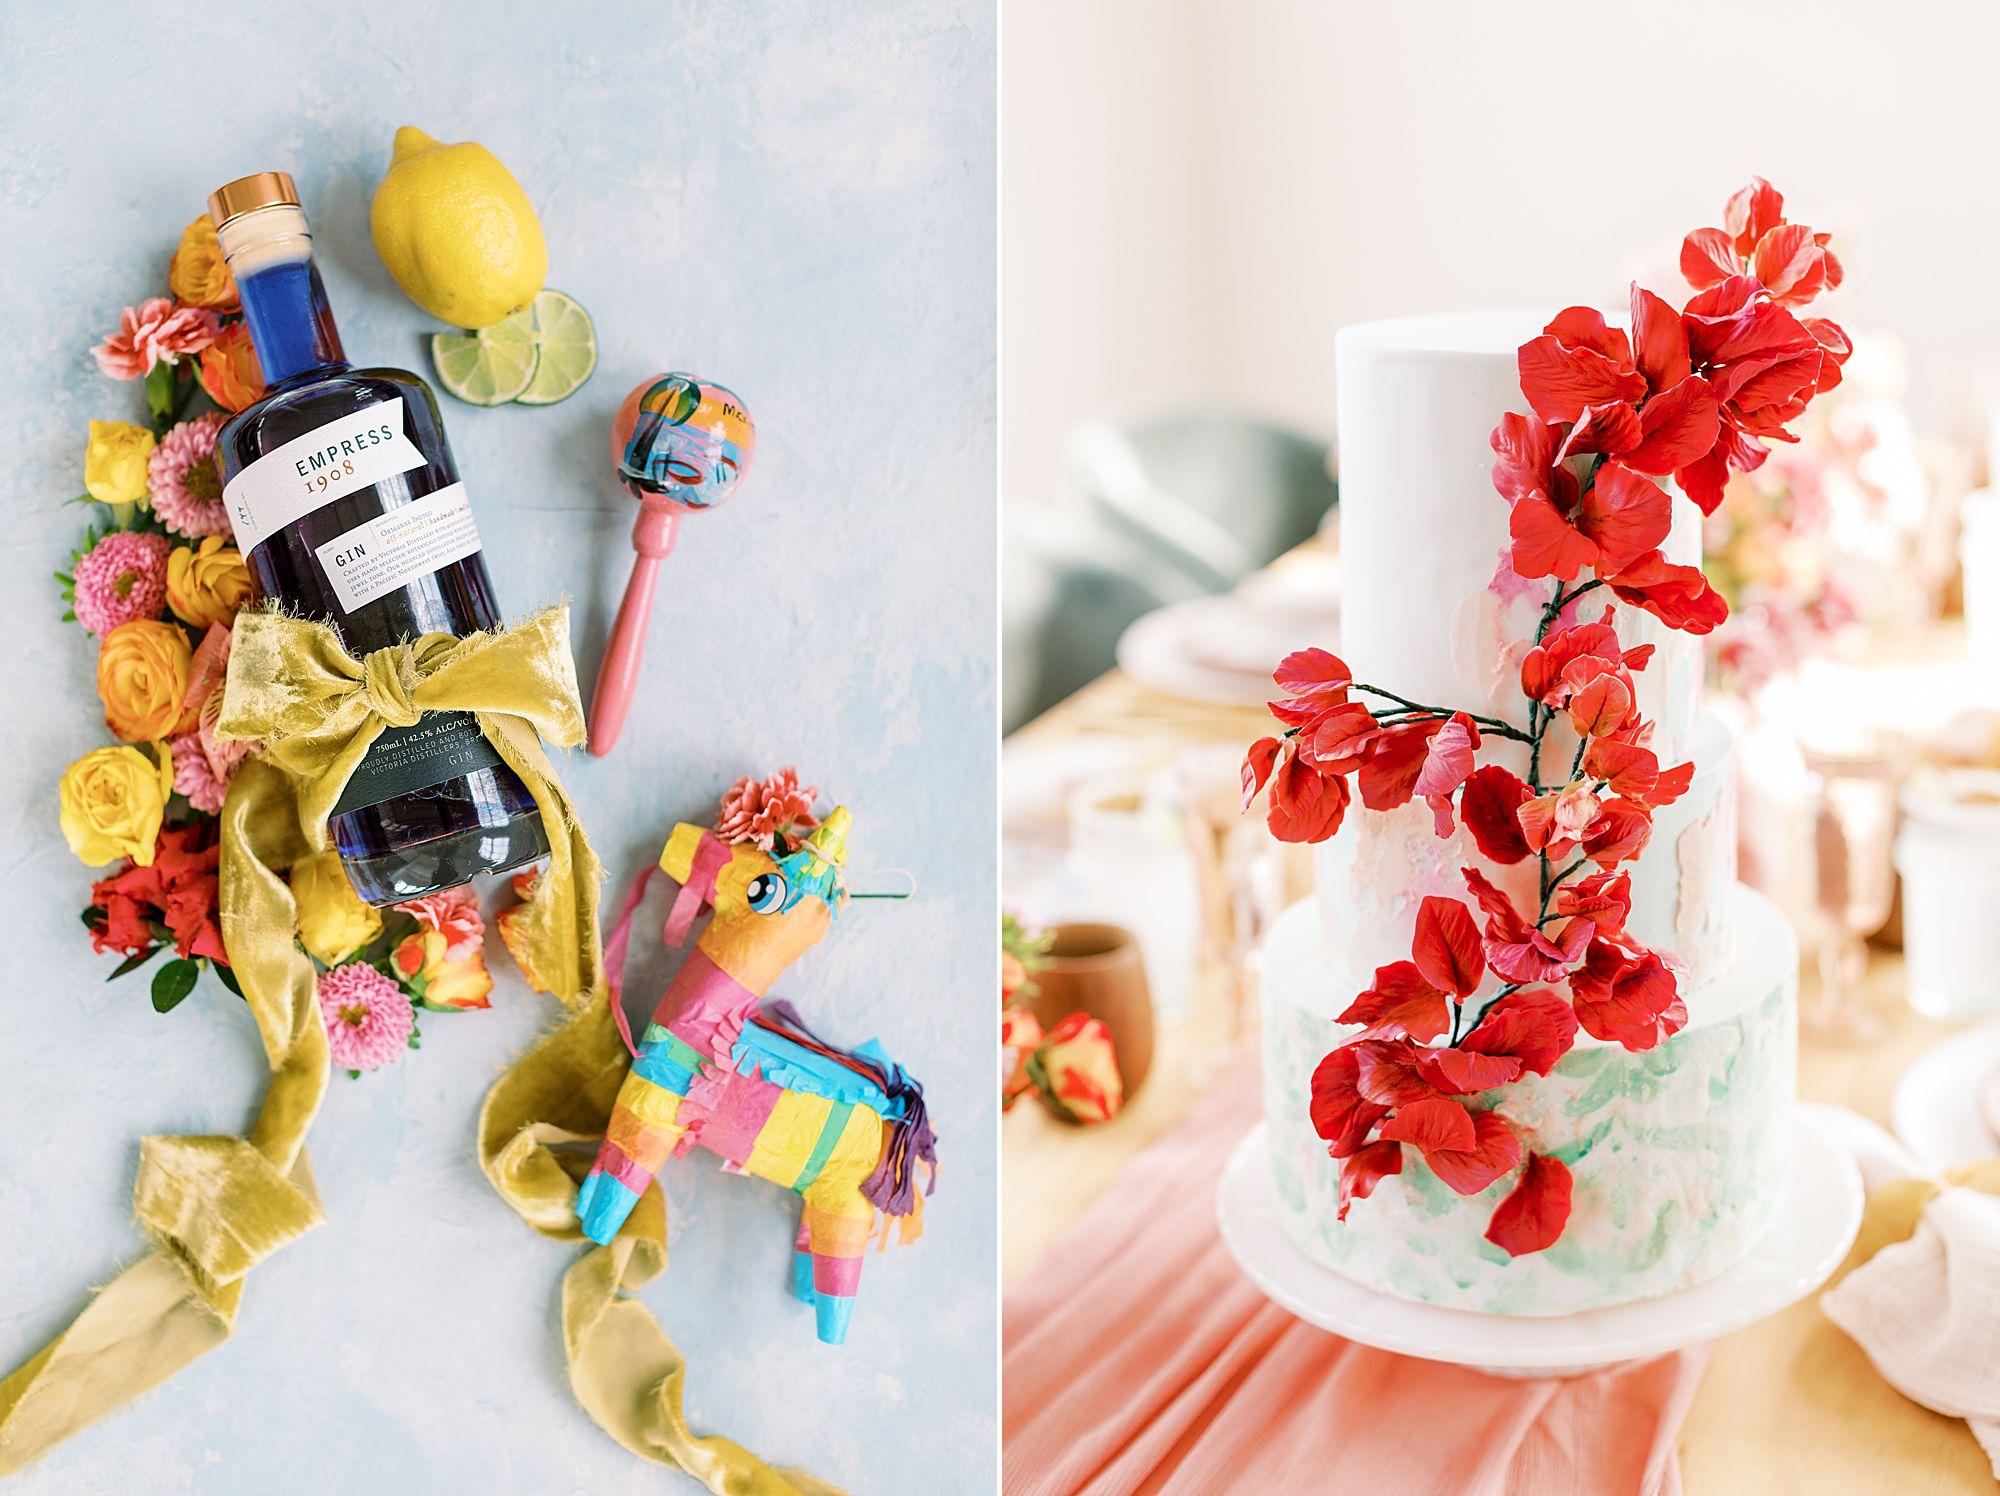 Cinco De Mayo Inspiration for Your FIesta - Party Crush Studio and Ashley Baumgartner_0024.jpg